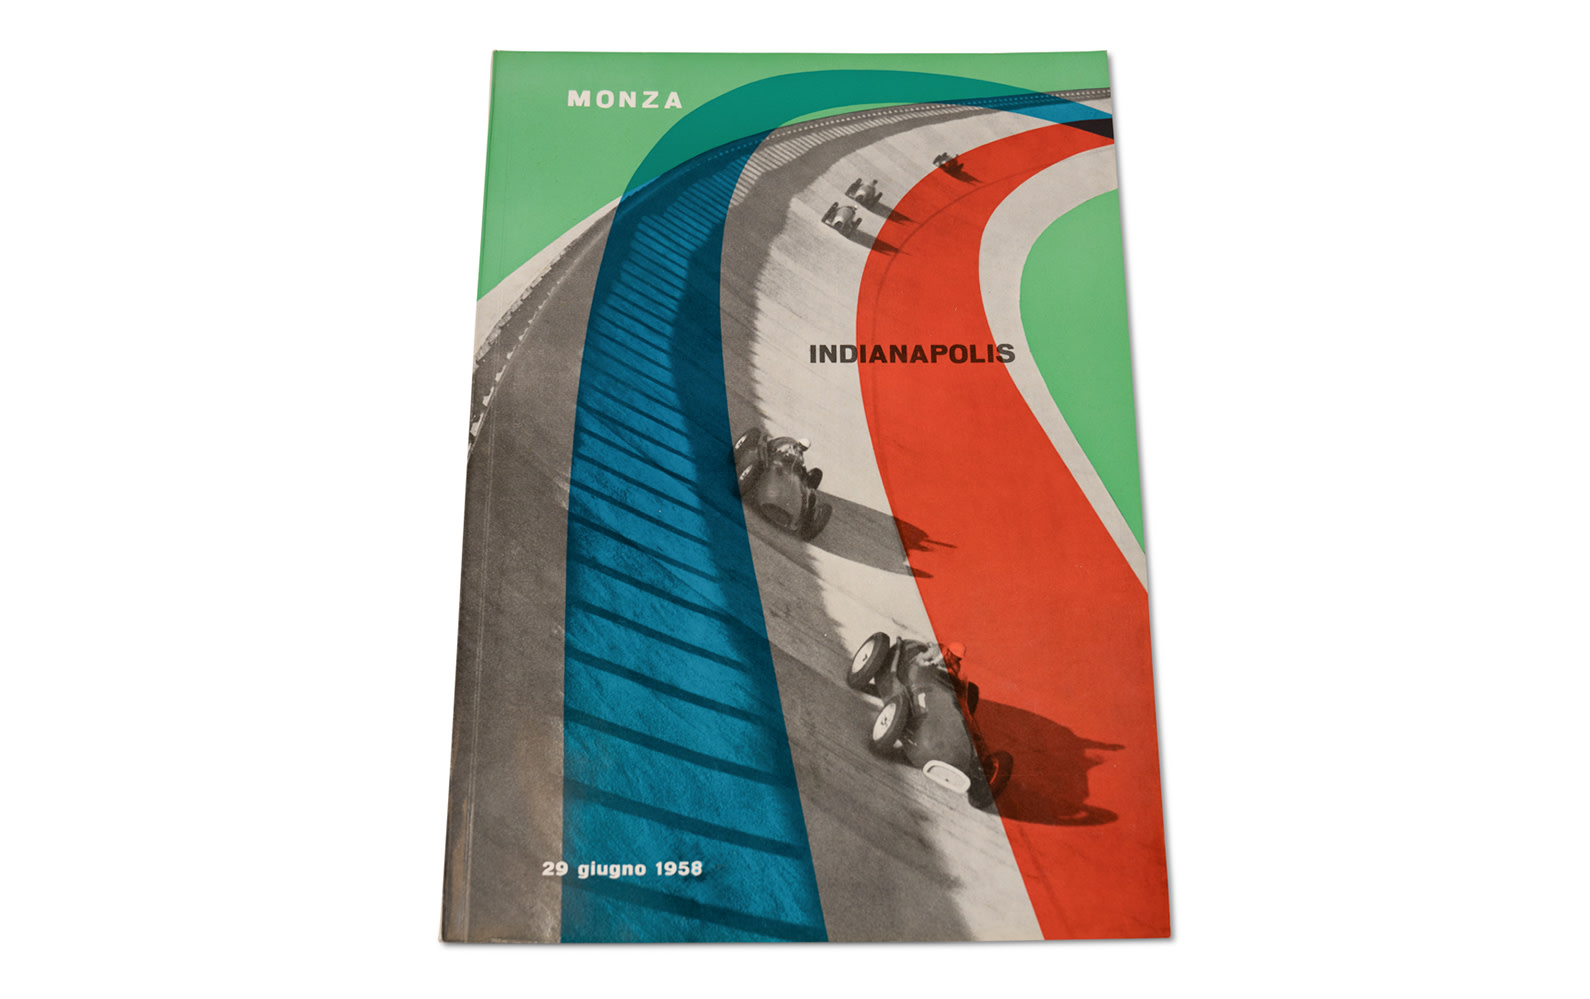 1958 Monza-Indianapolis Official Race Program